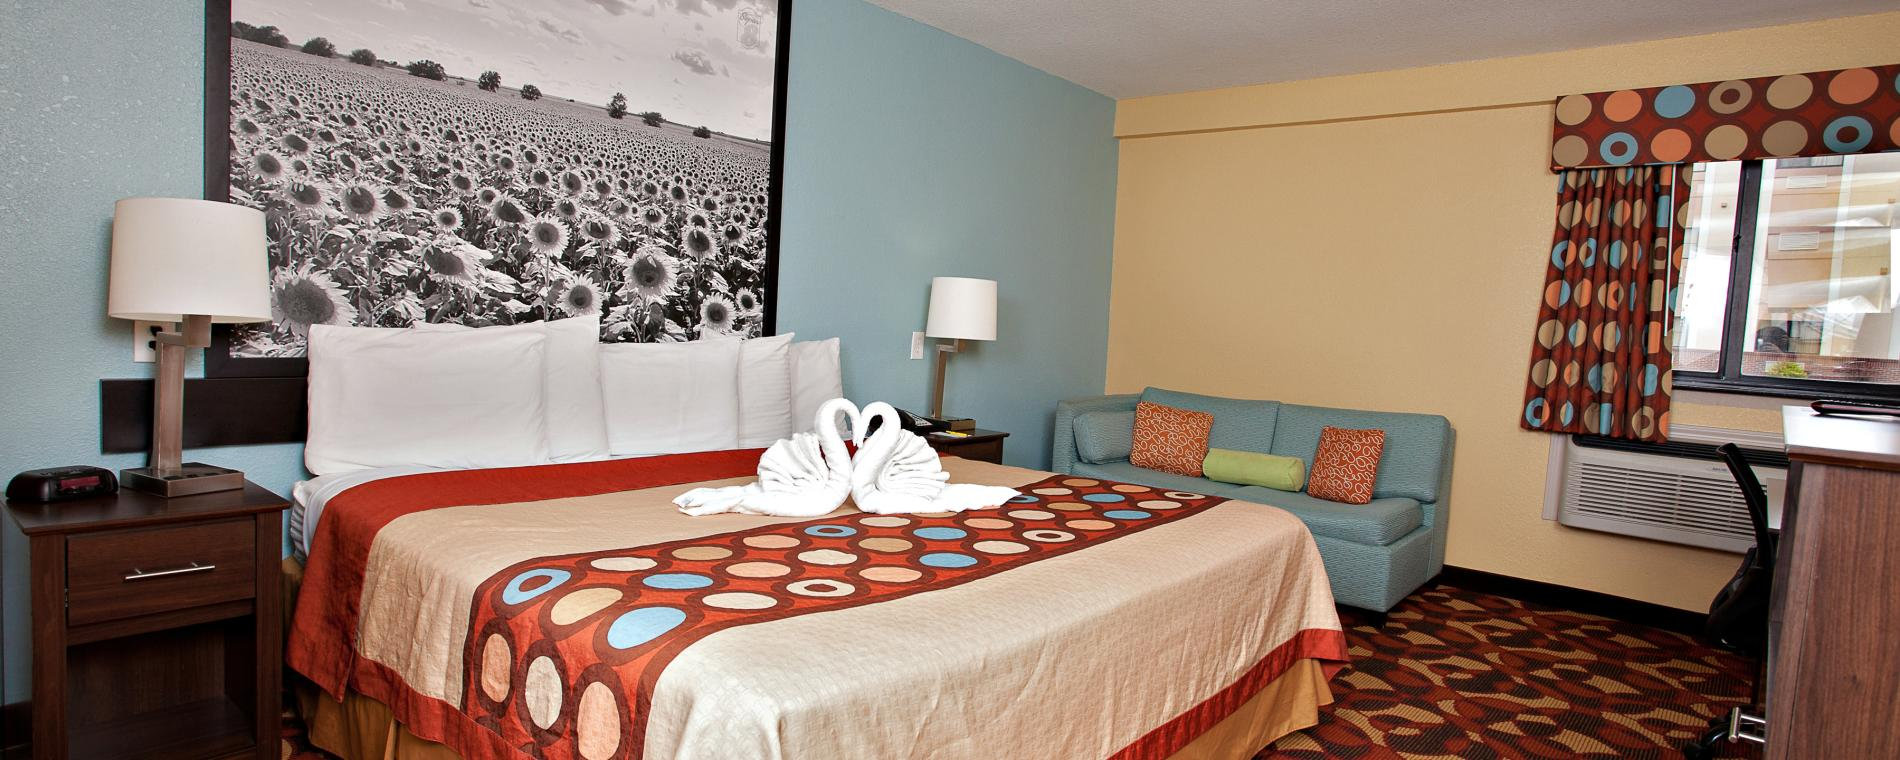 Super 8 Hotel Room